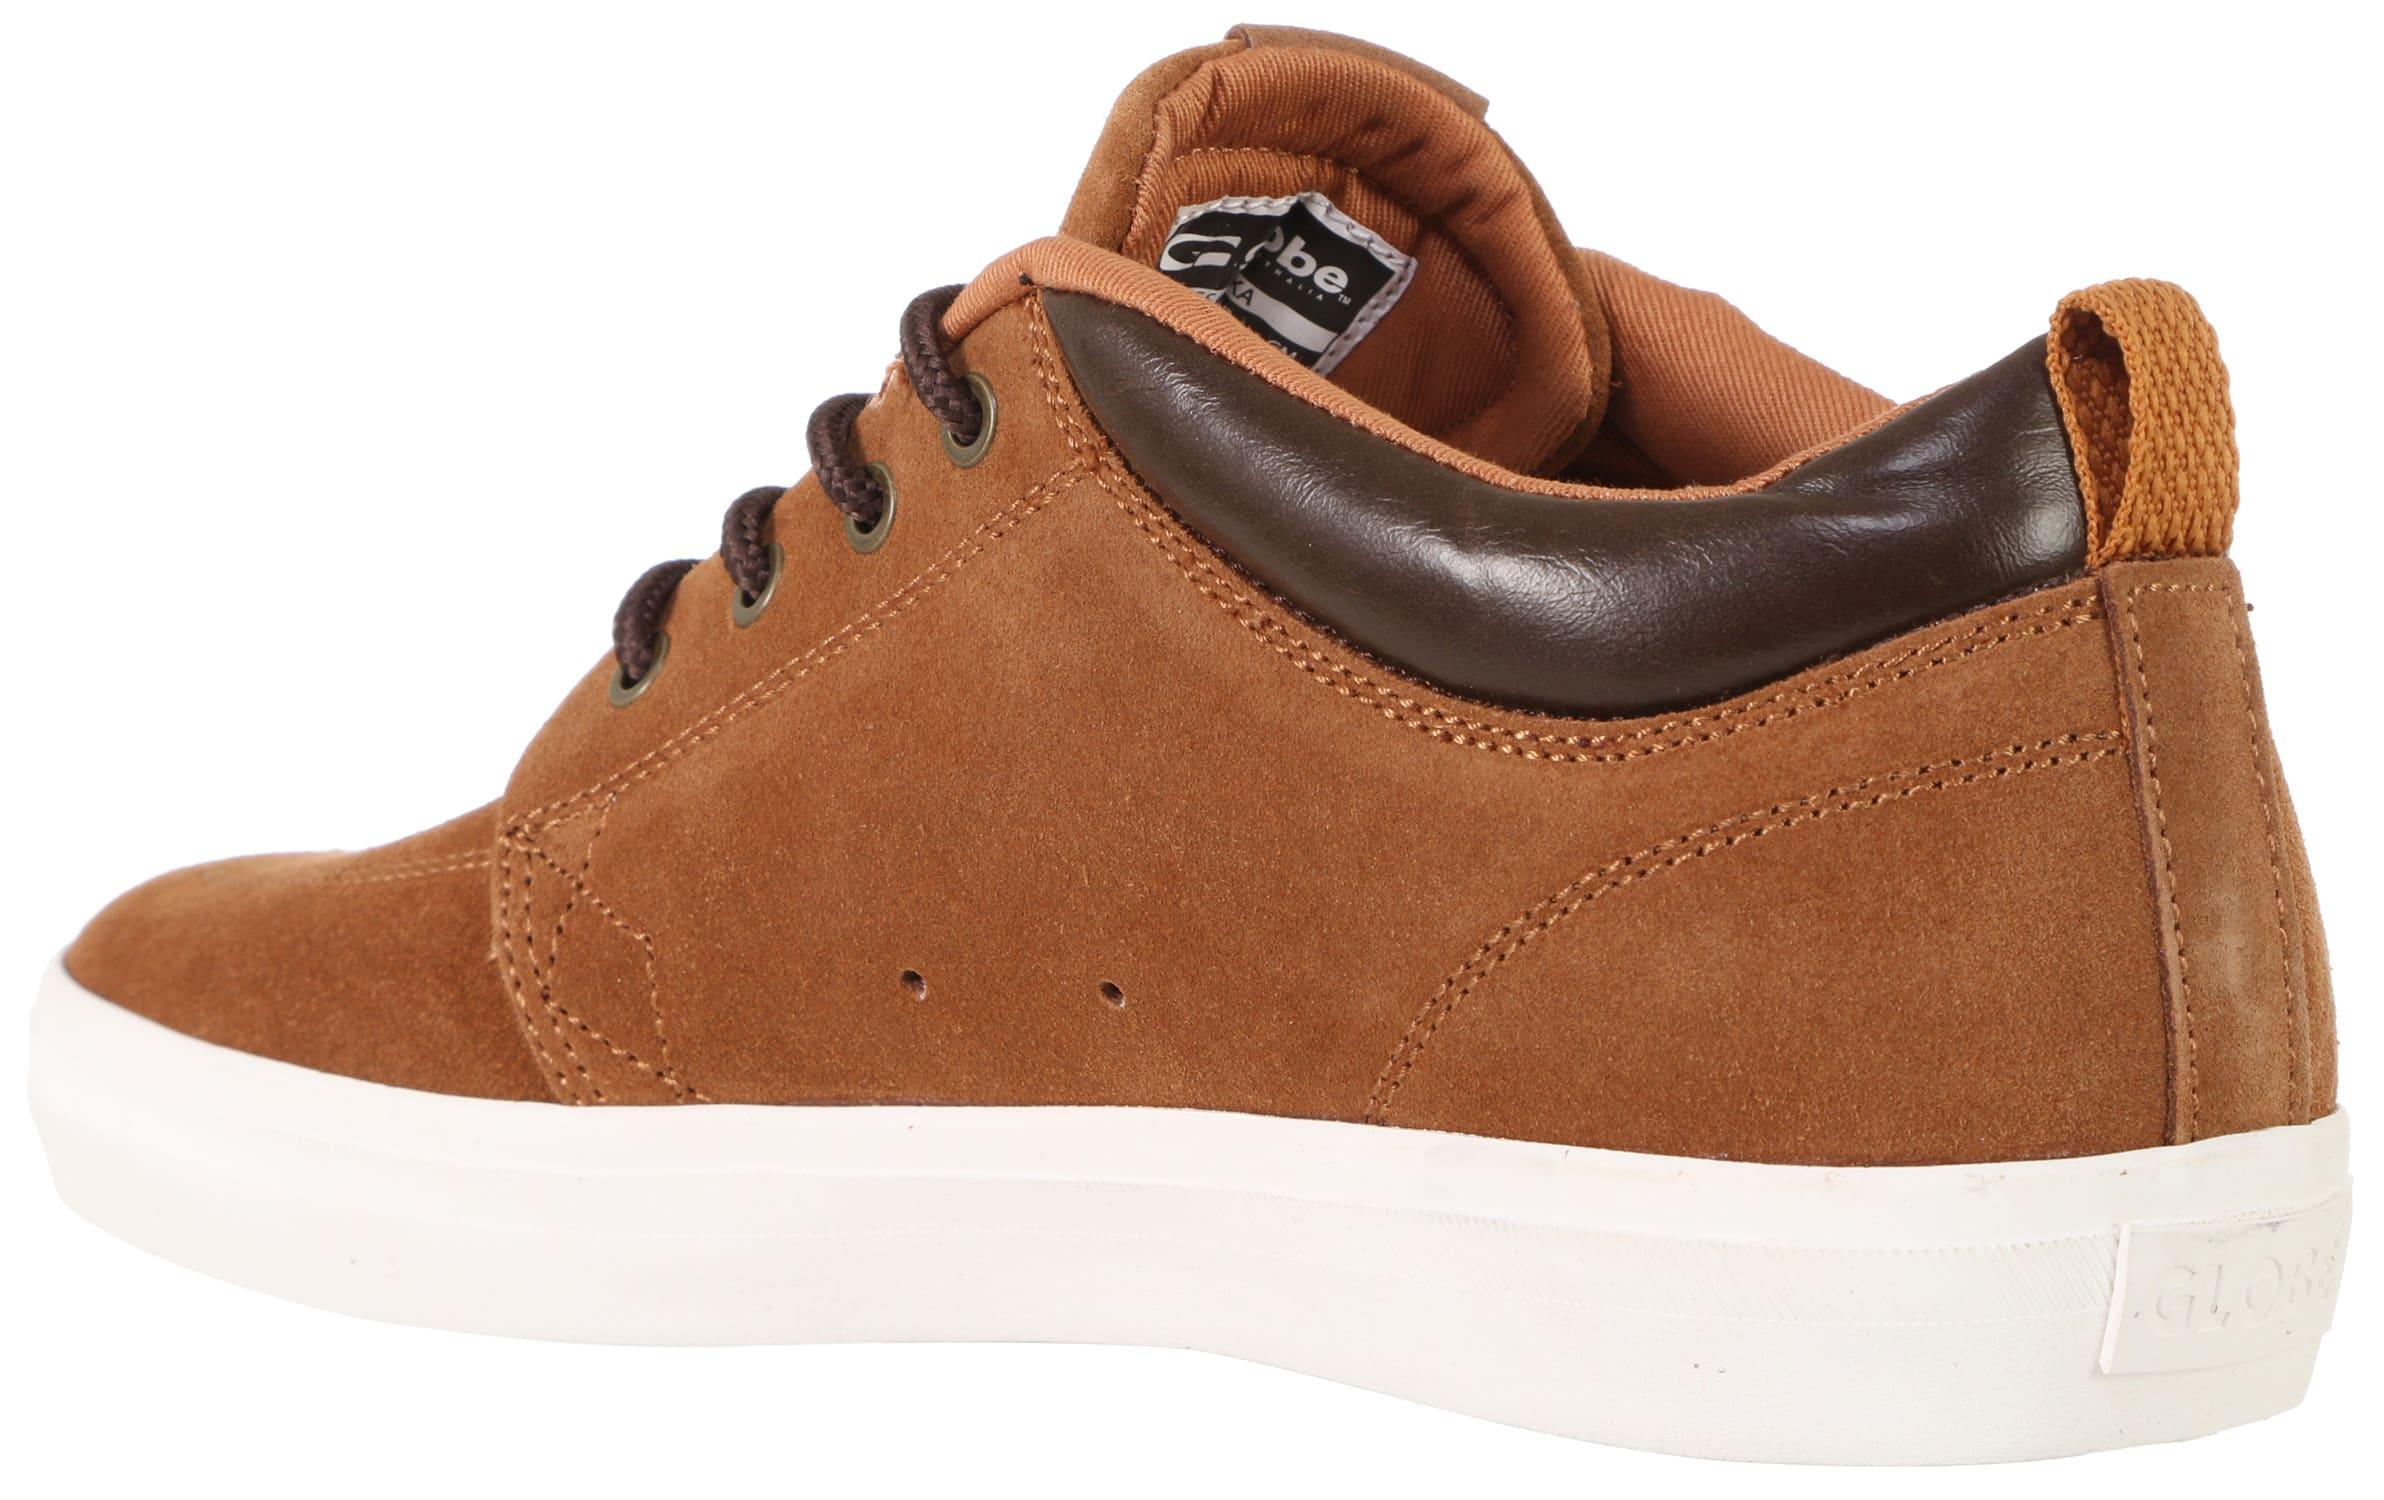 fba021cc31 Globe GS Chukka Skate Shoes - thumbnail 3